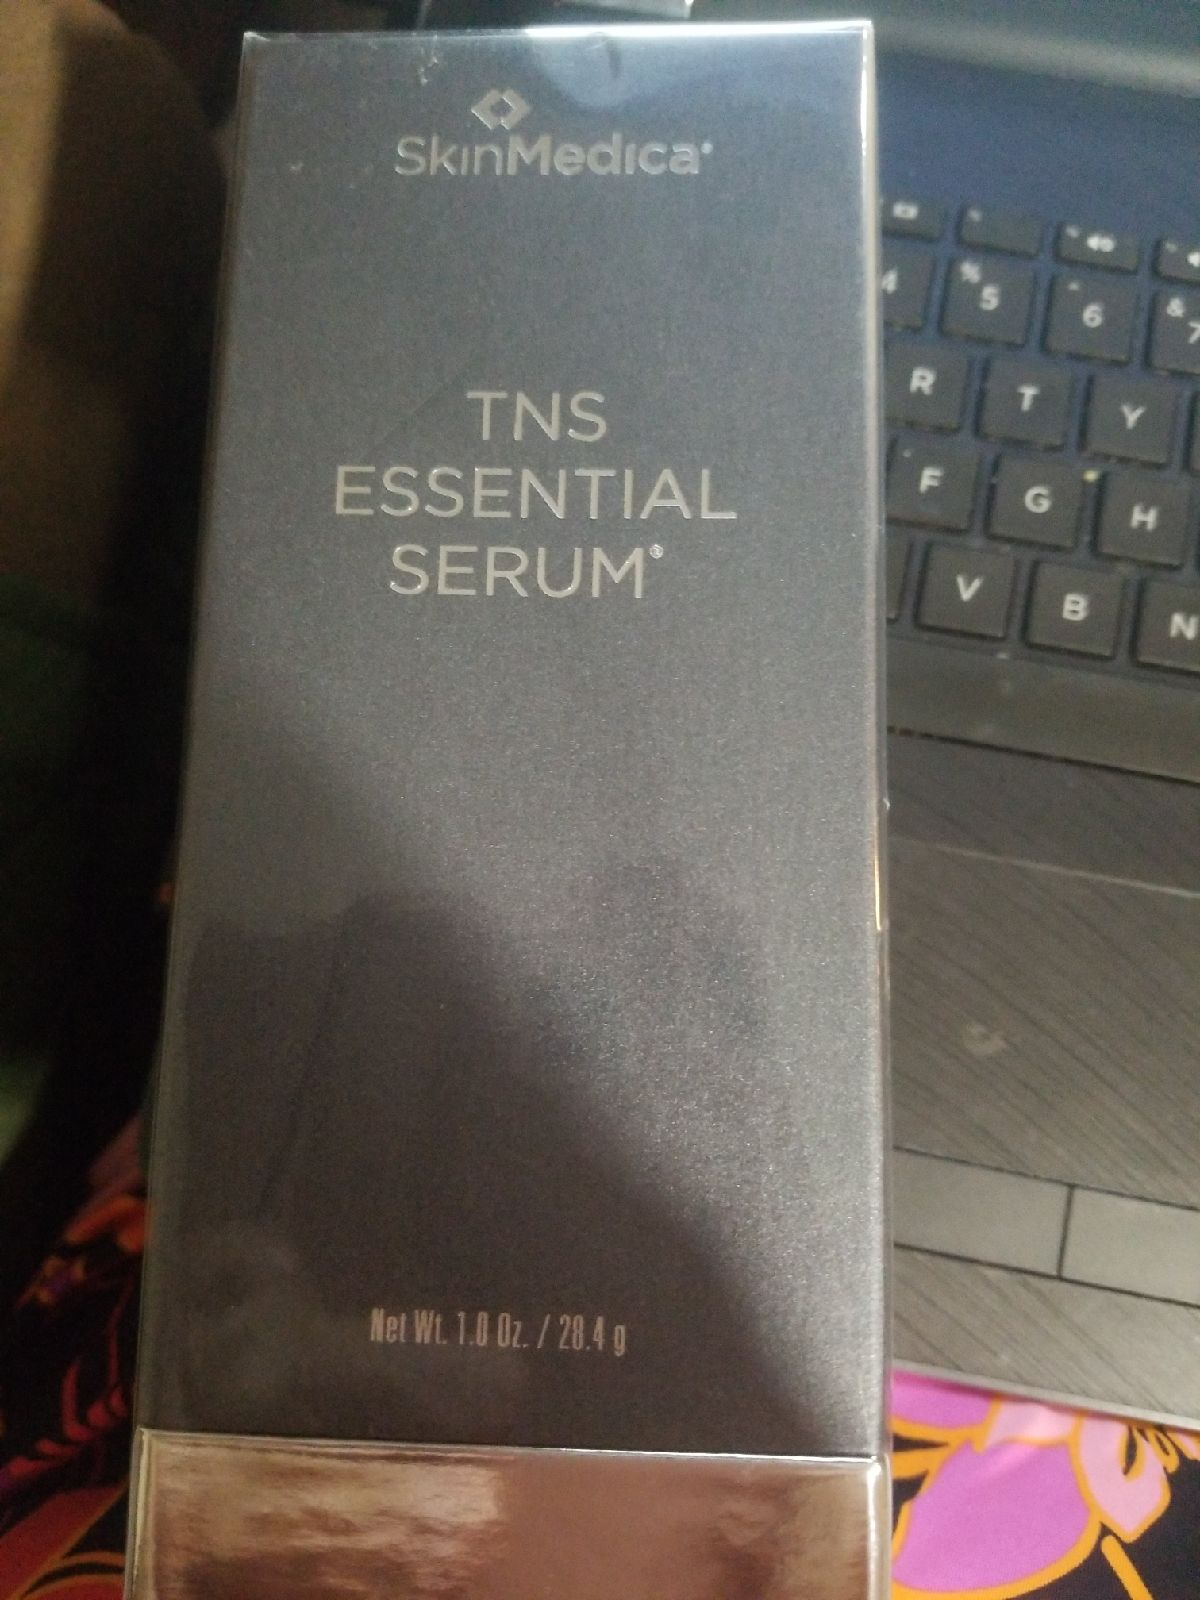 SkinMedica TNS Essentisls Serum 1oz EXP